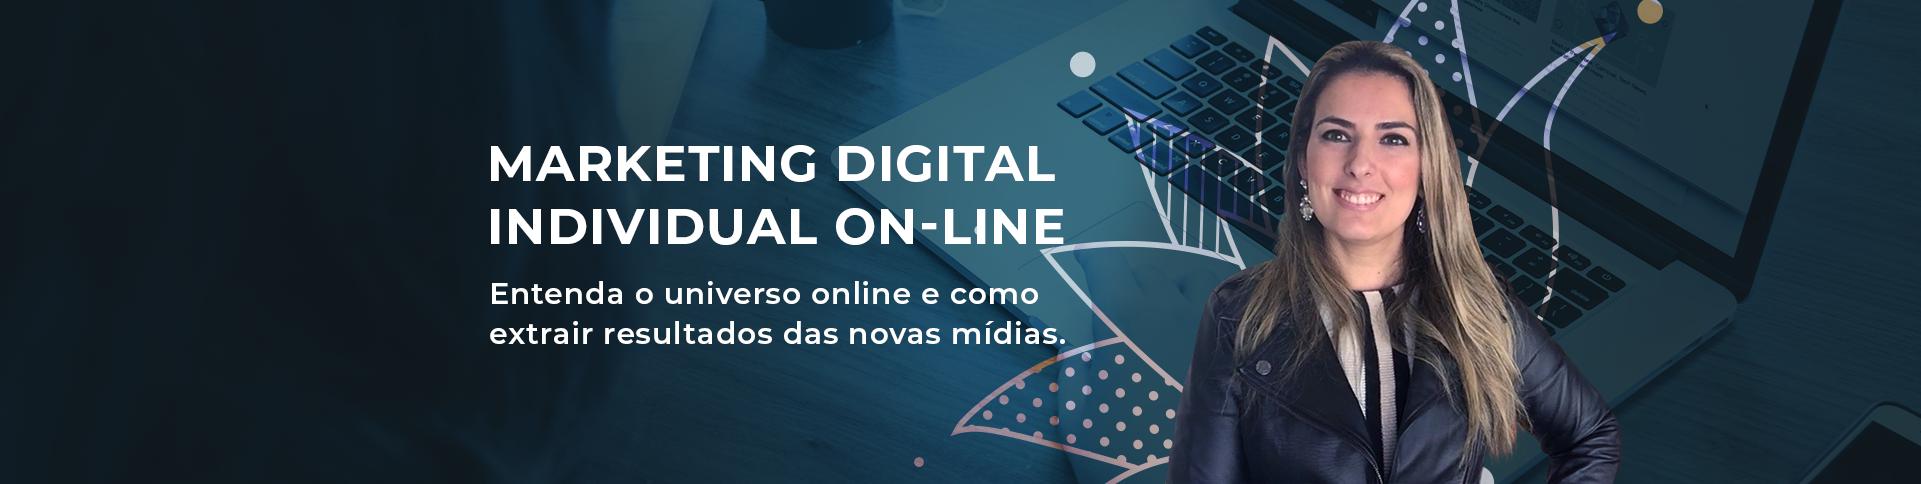 banner_curso_online_mkt-digital-individual